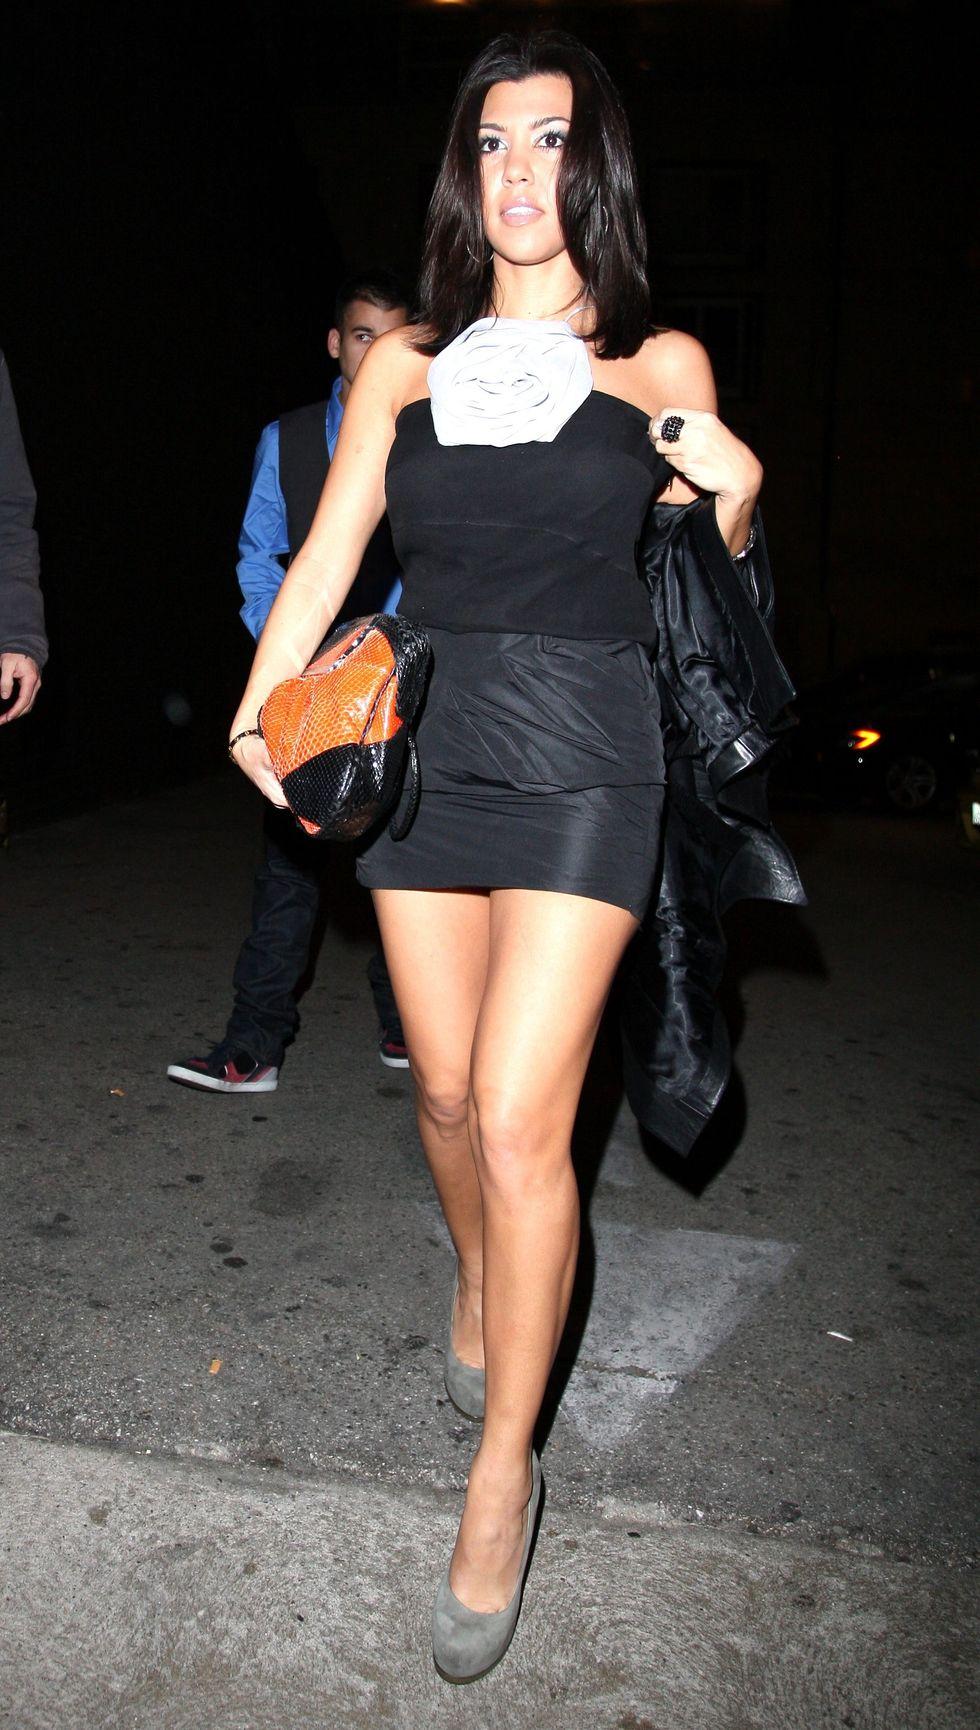 kourtney-kardashian-at-deluxe-nightclub-in-hollywood-01